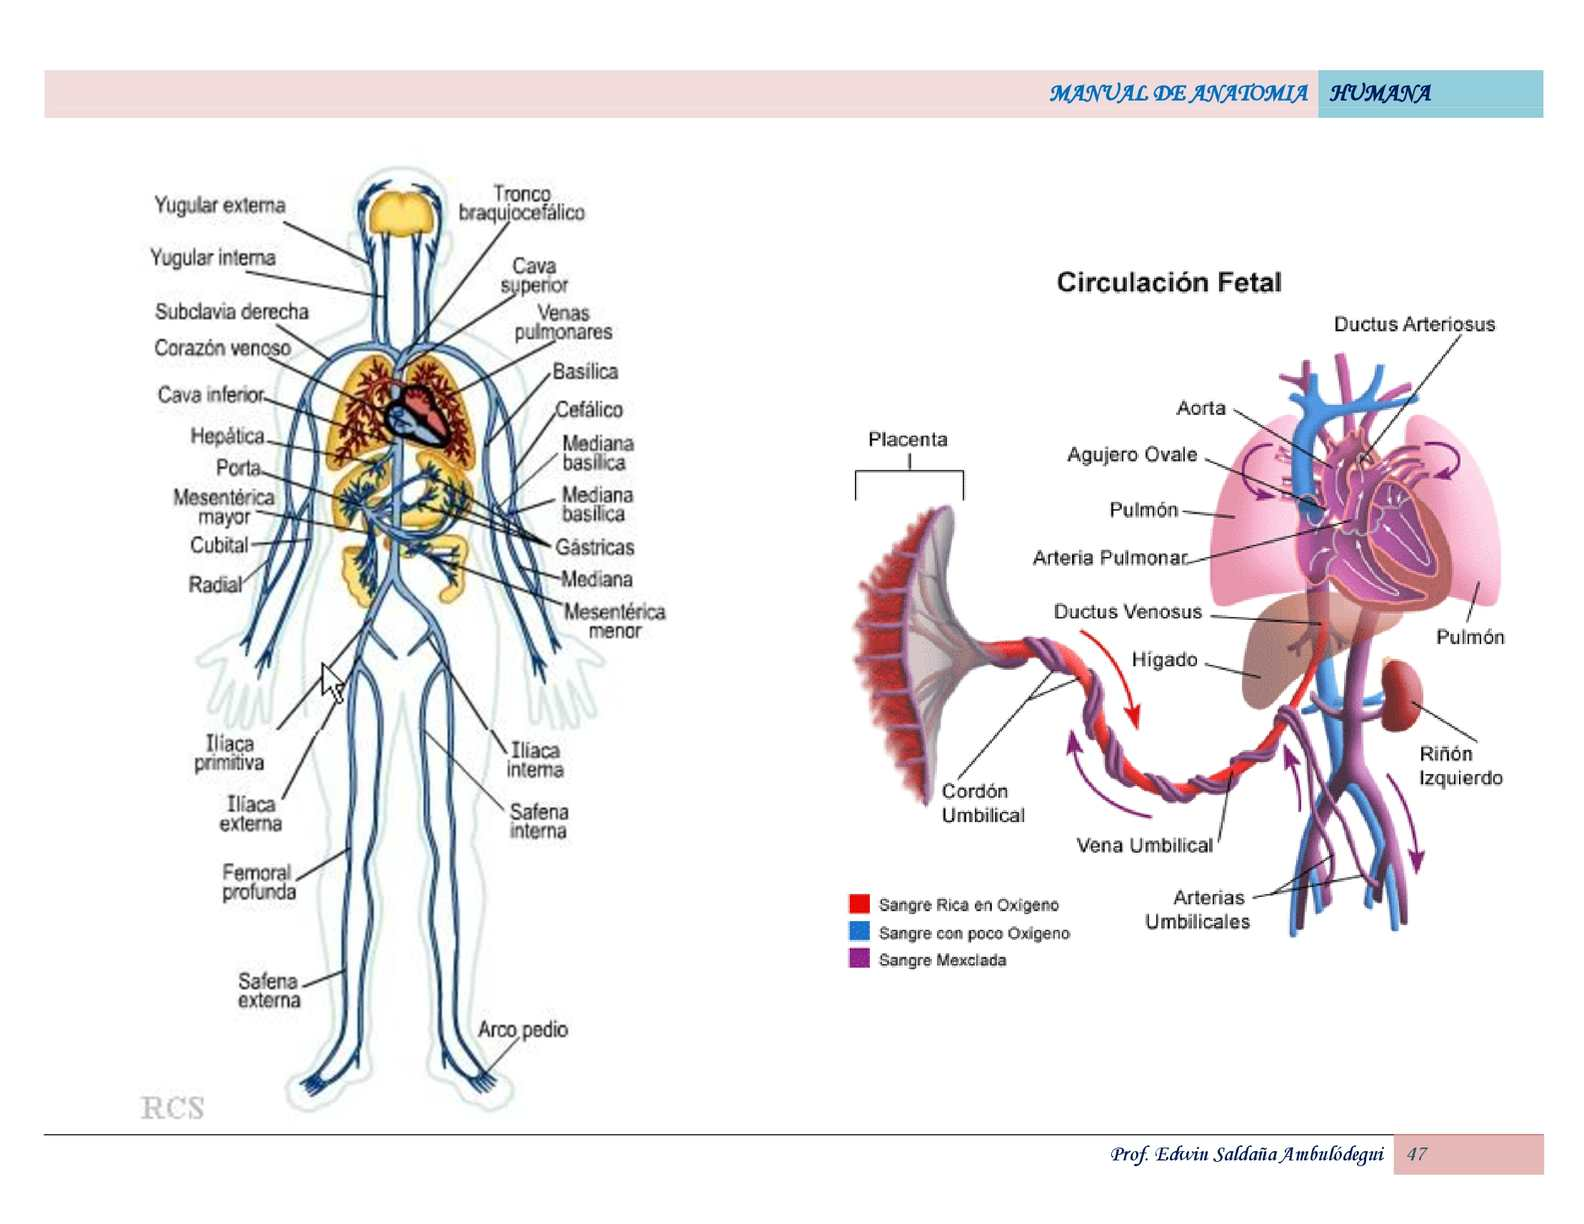 atlas de anatomia humana-edwin ambulodegui - CALAMEO Downloader